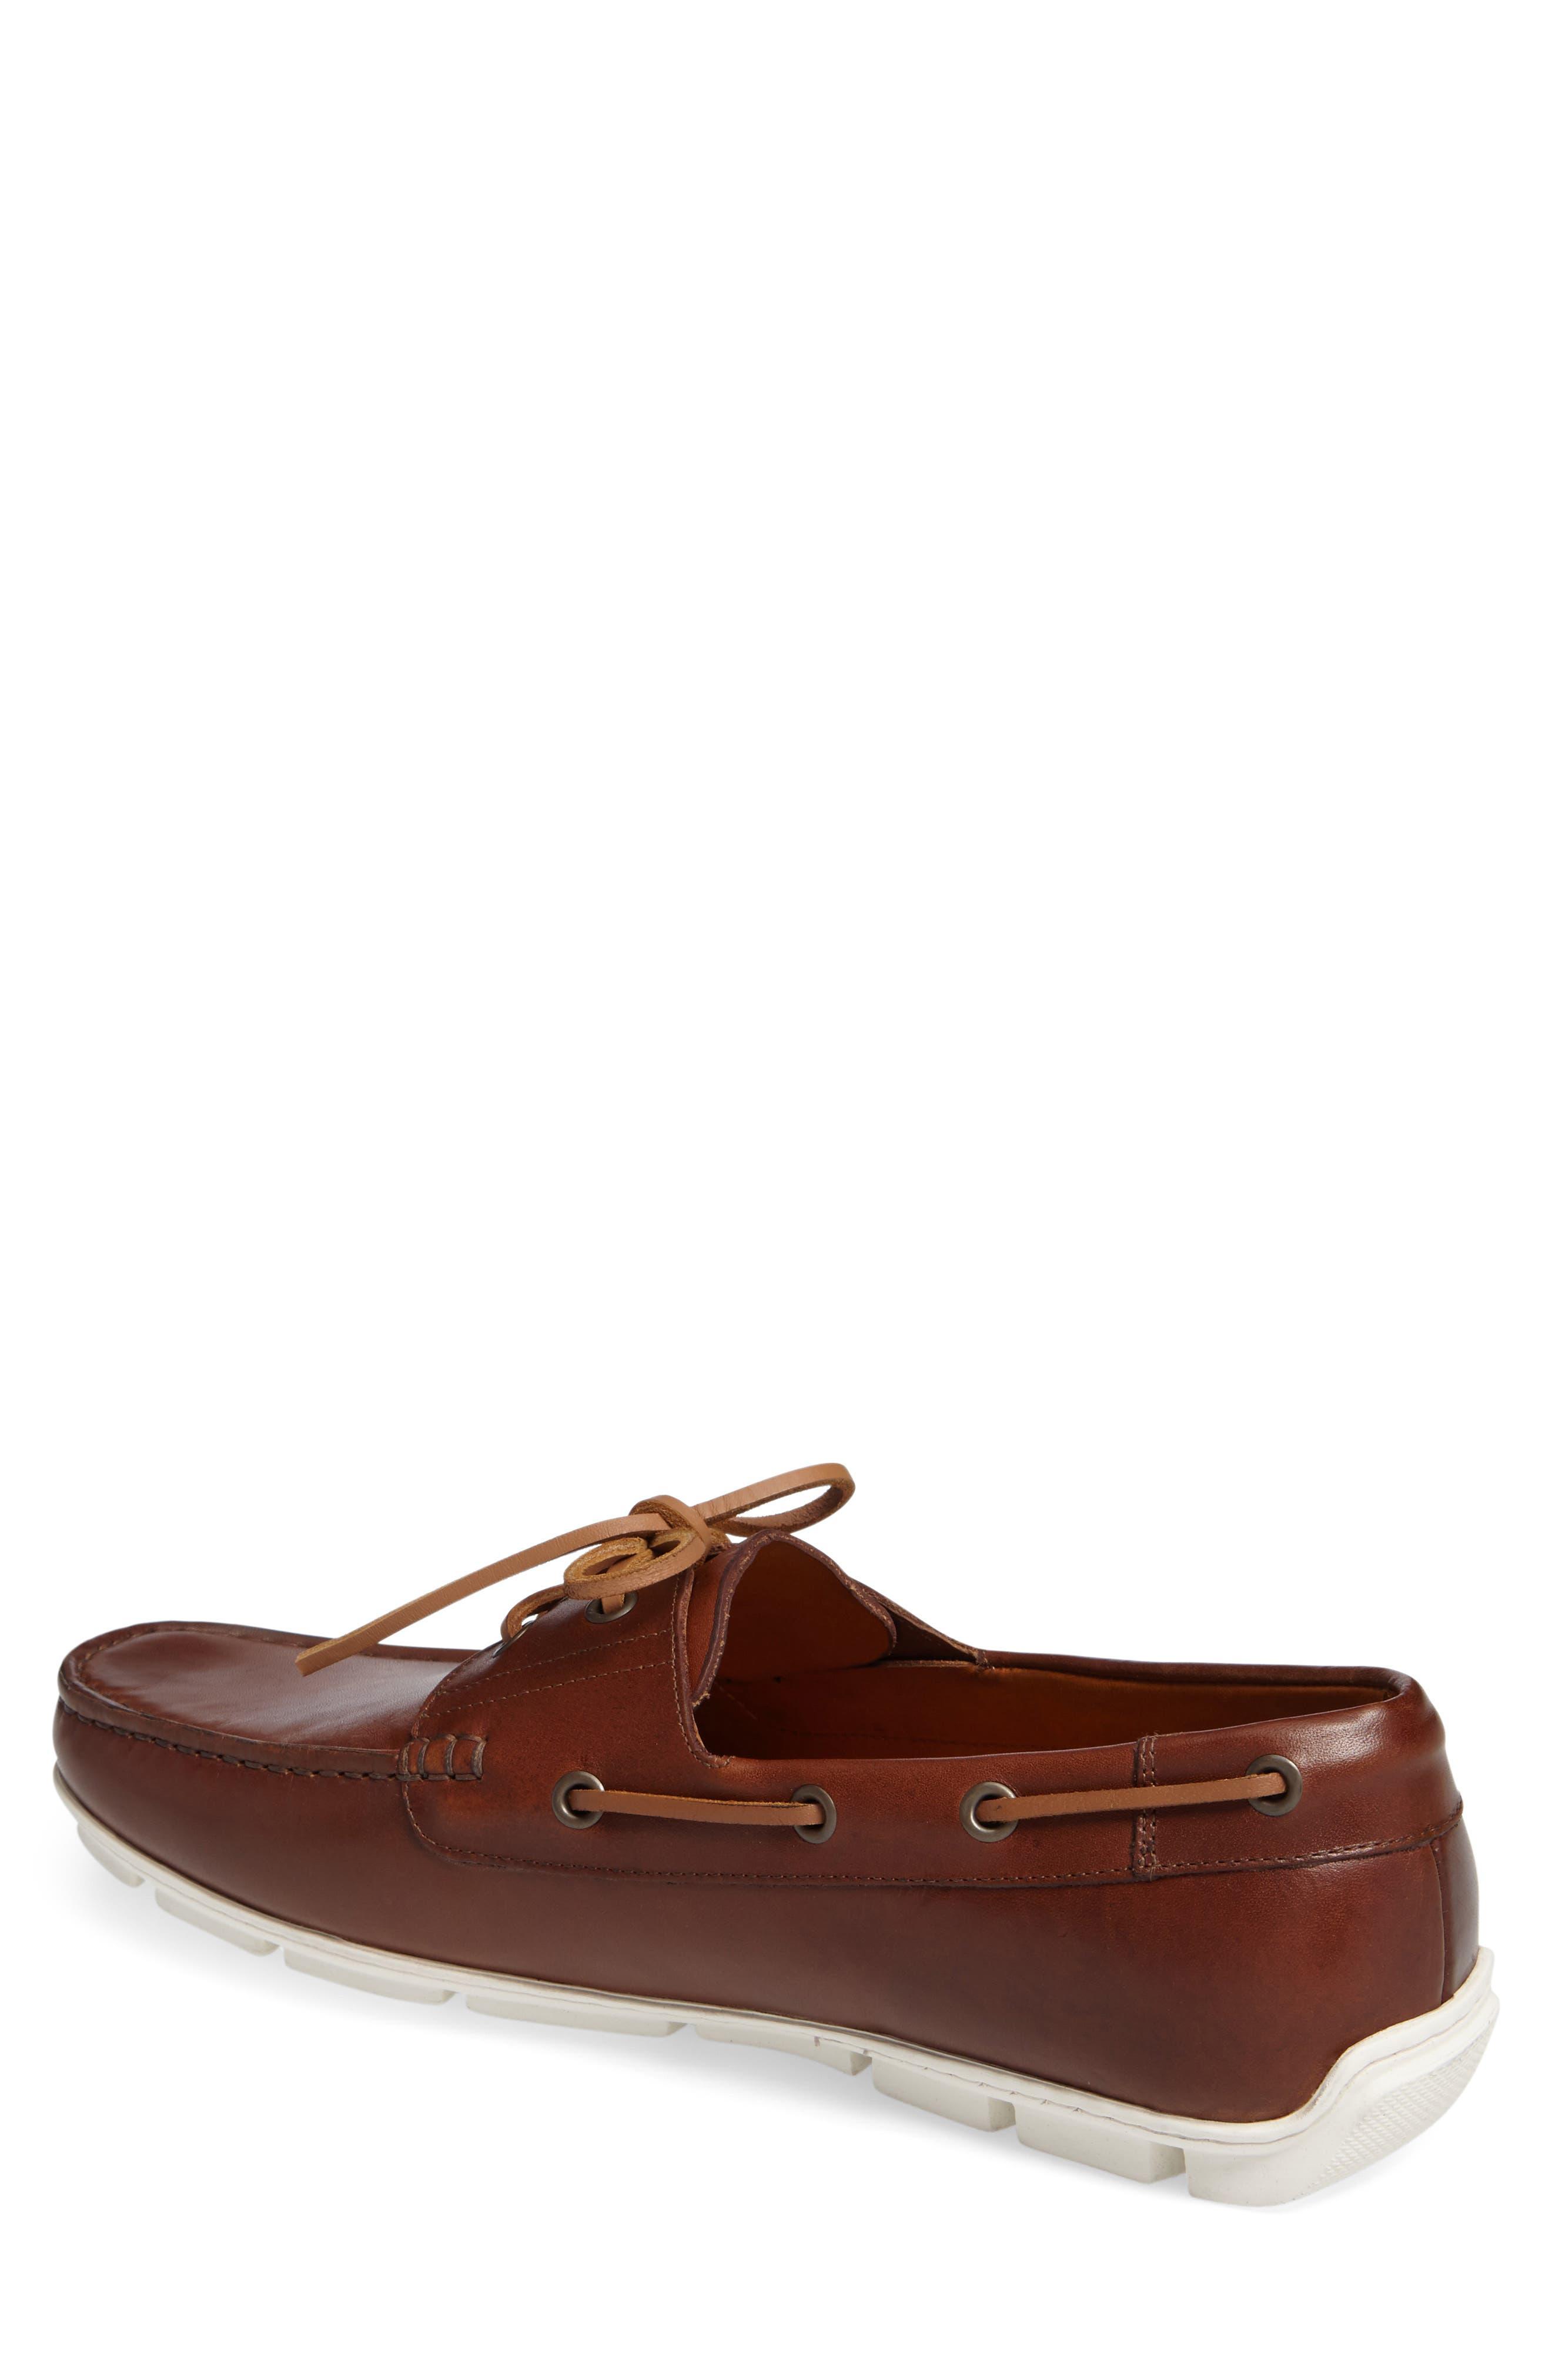 Don Boat Shoe,                             Alternate thumbnail 2, color,                             240